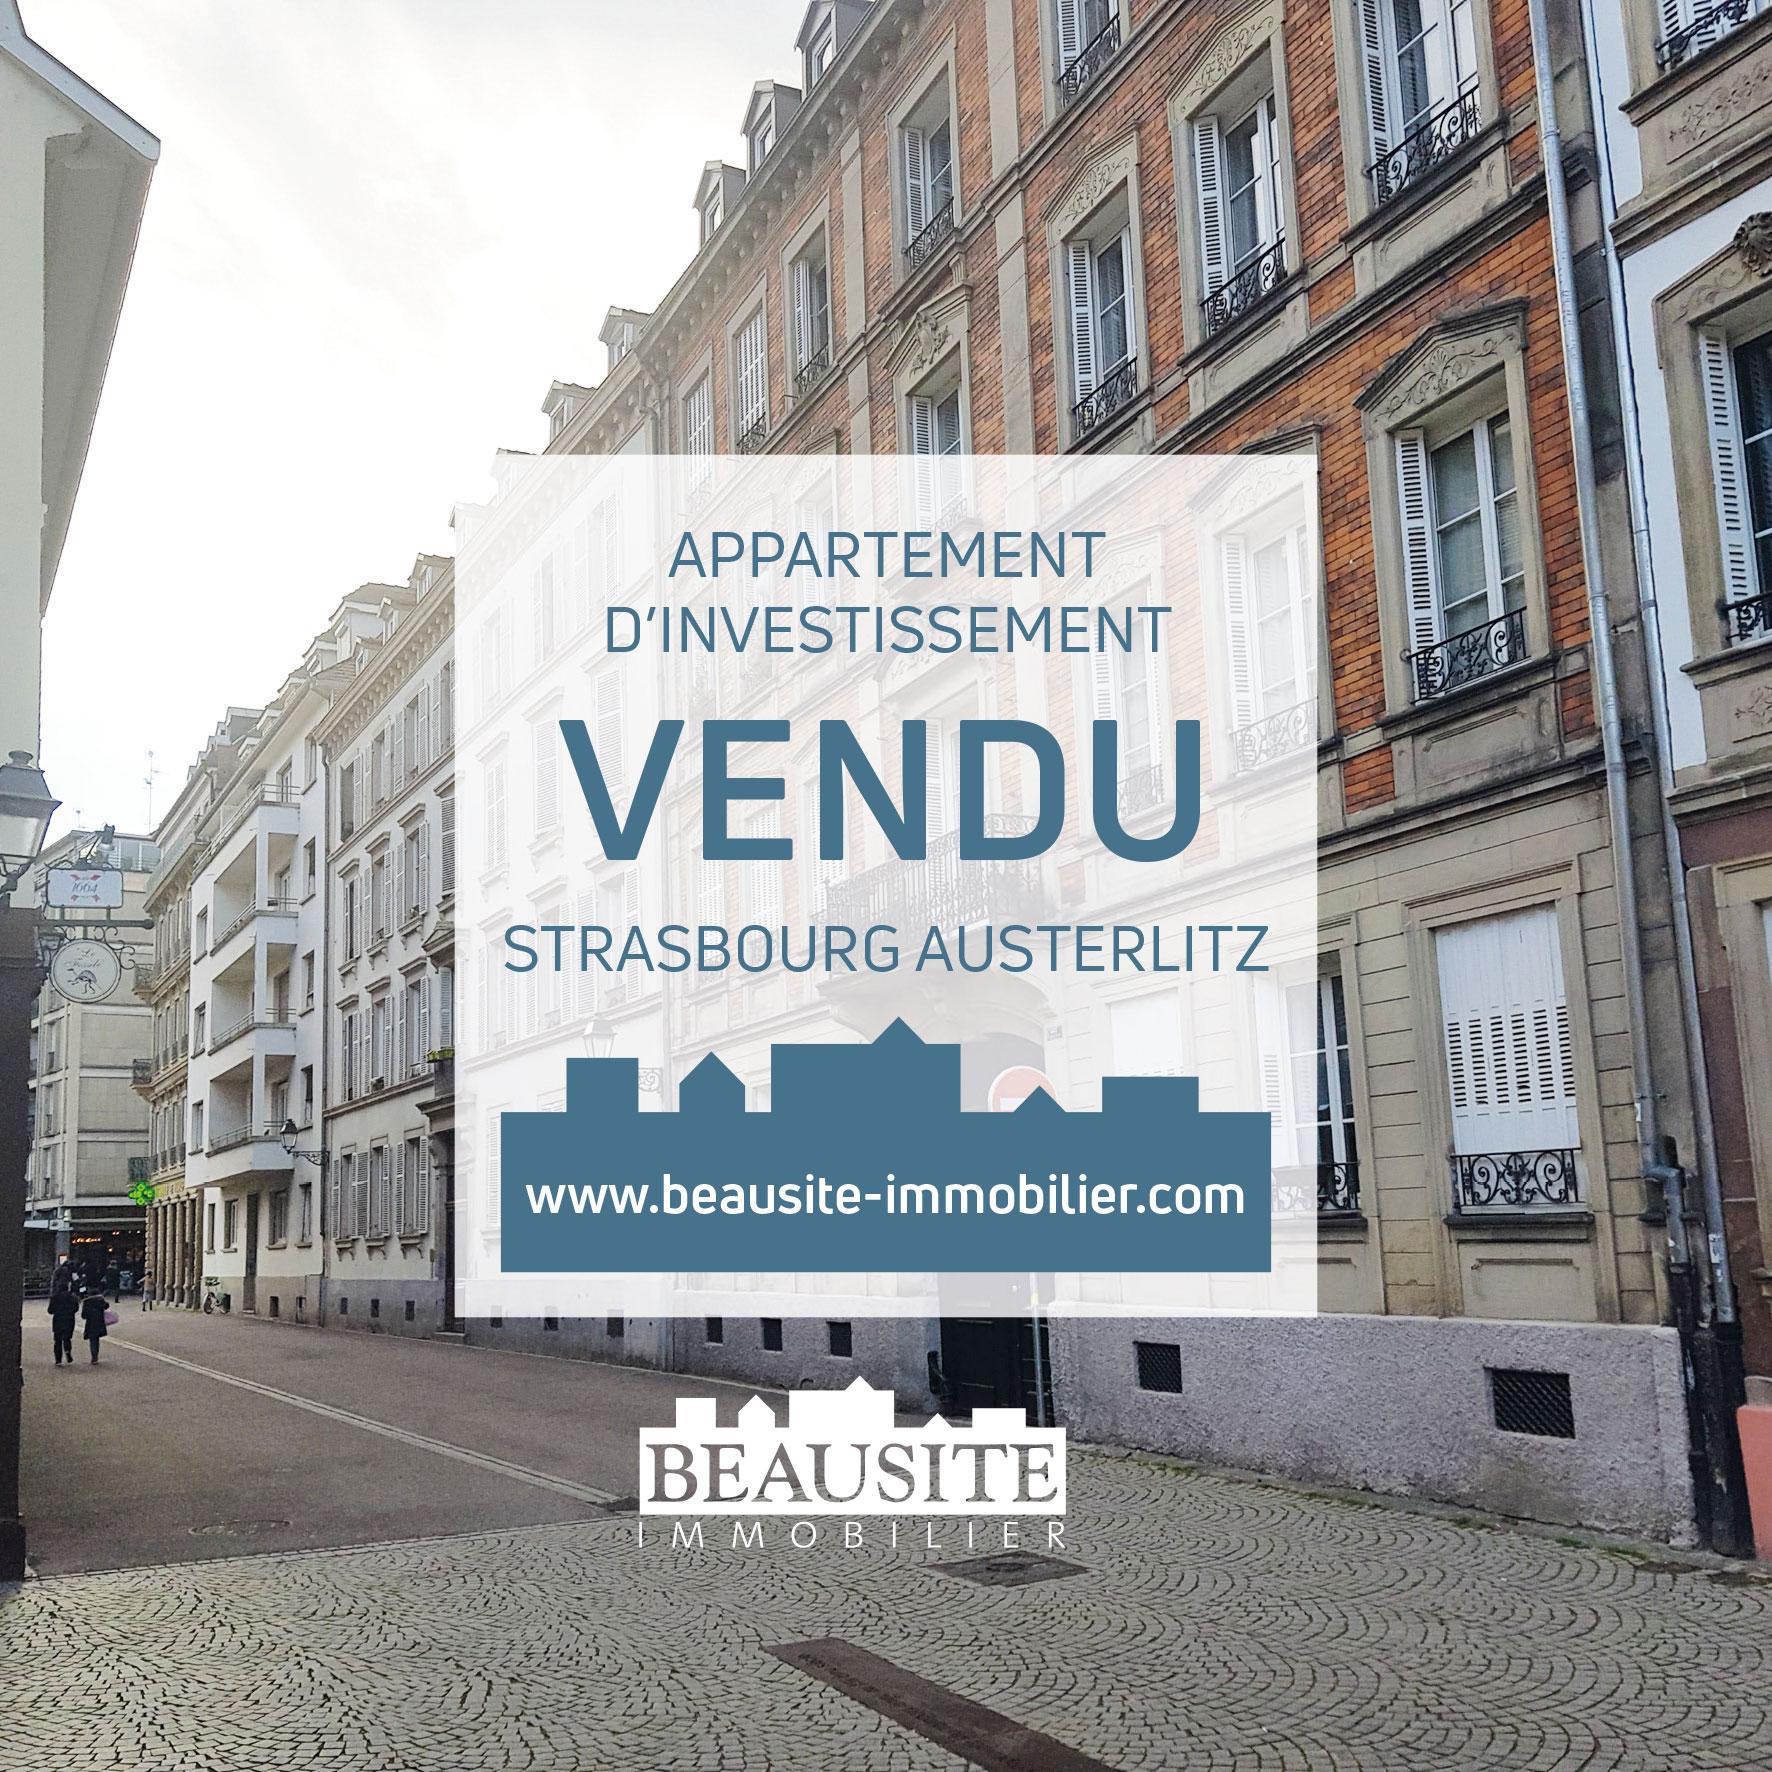 VENDU ! Charmant 2P - Strasbourg Austerlitz - nos ventes - Beausite Immobilier 1